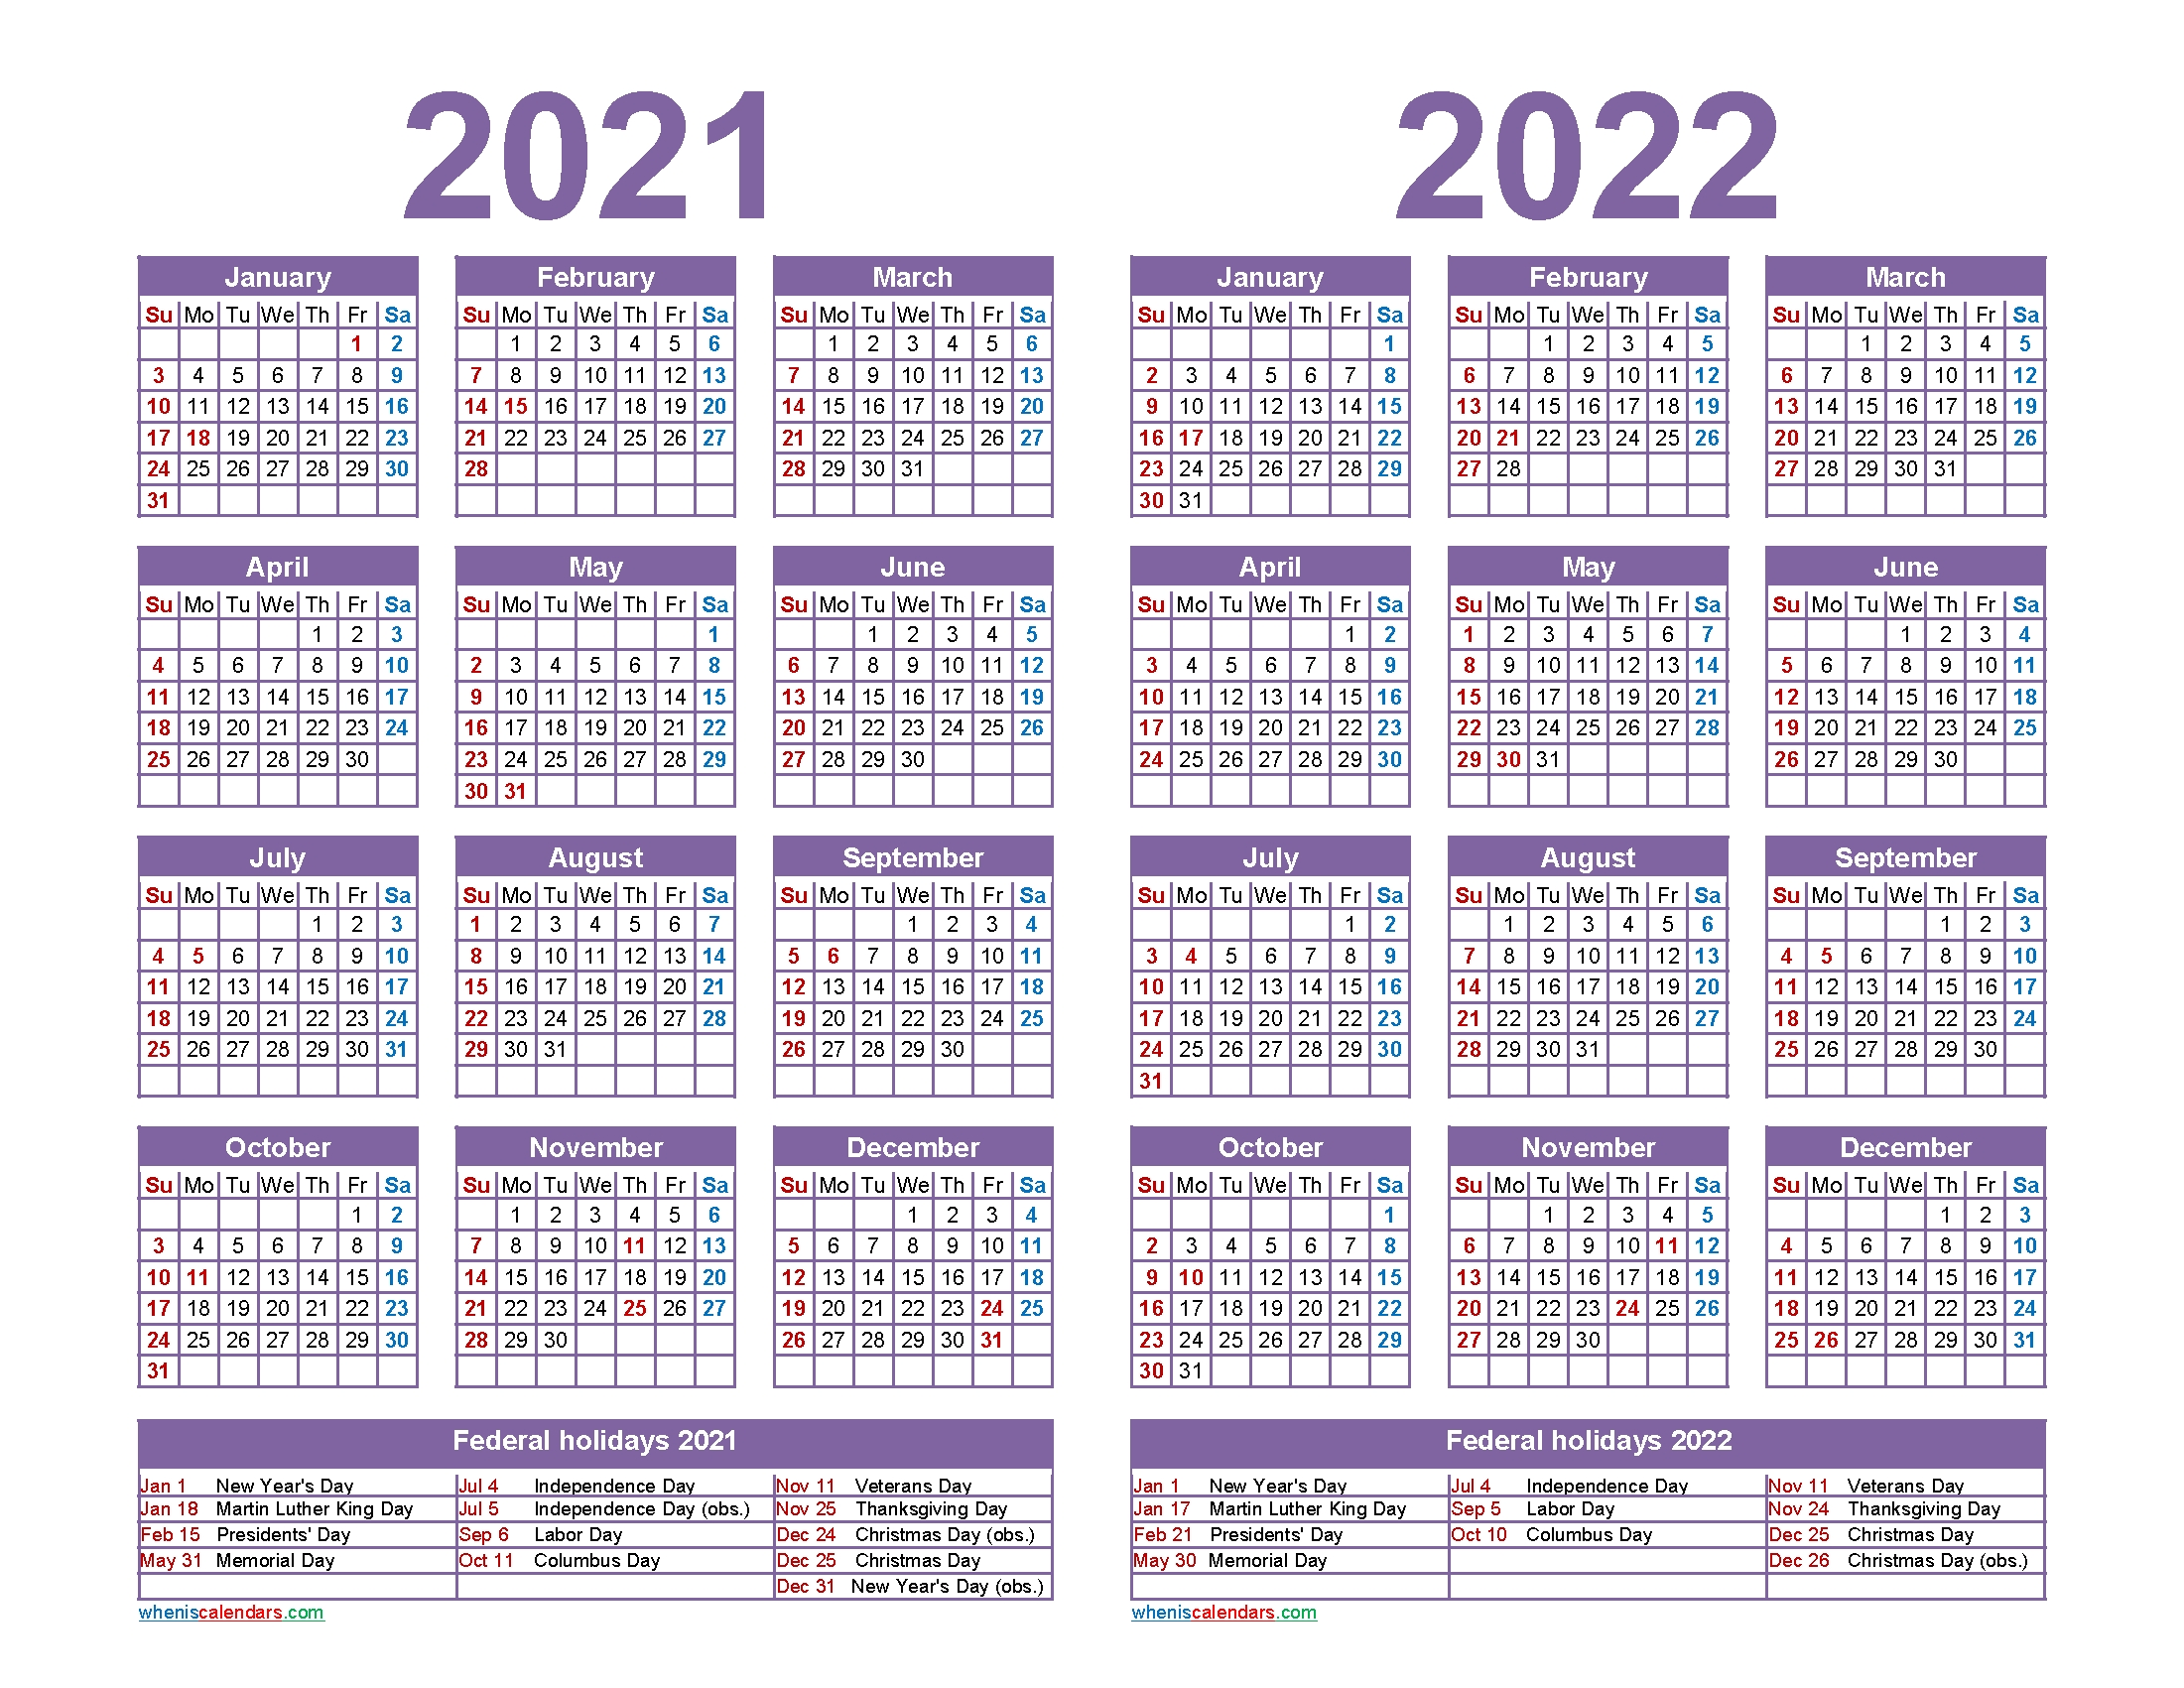 Free 2021 2022 Calendar Printable With Holidays – Free 2020